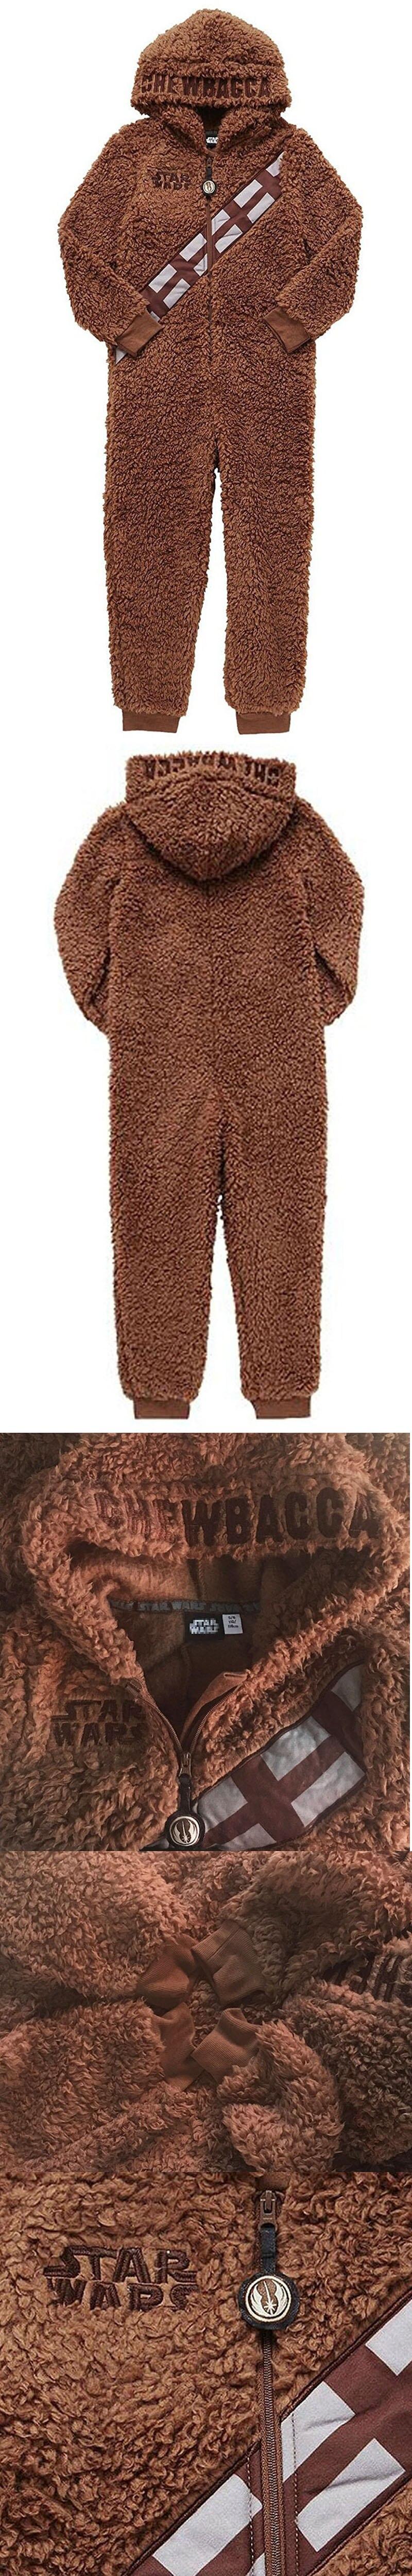 Star War Boys Chewbacca Hooded Pajamas Cosplay Coral Fleece Kids Pajamas  Autumn Winter Warm Children Sleepwear 381d9314f